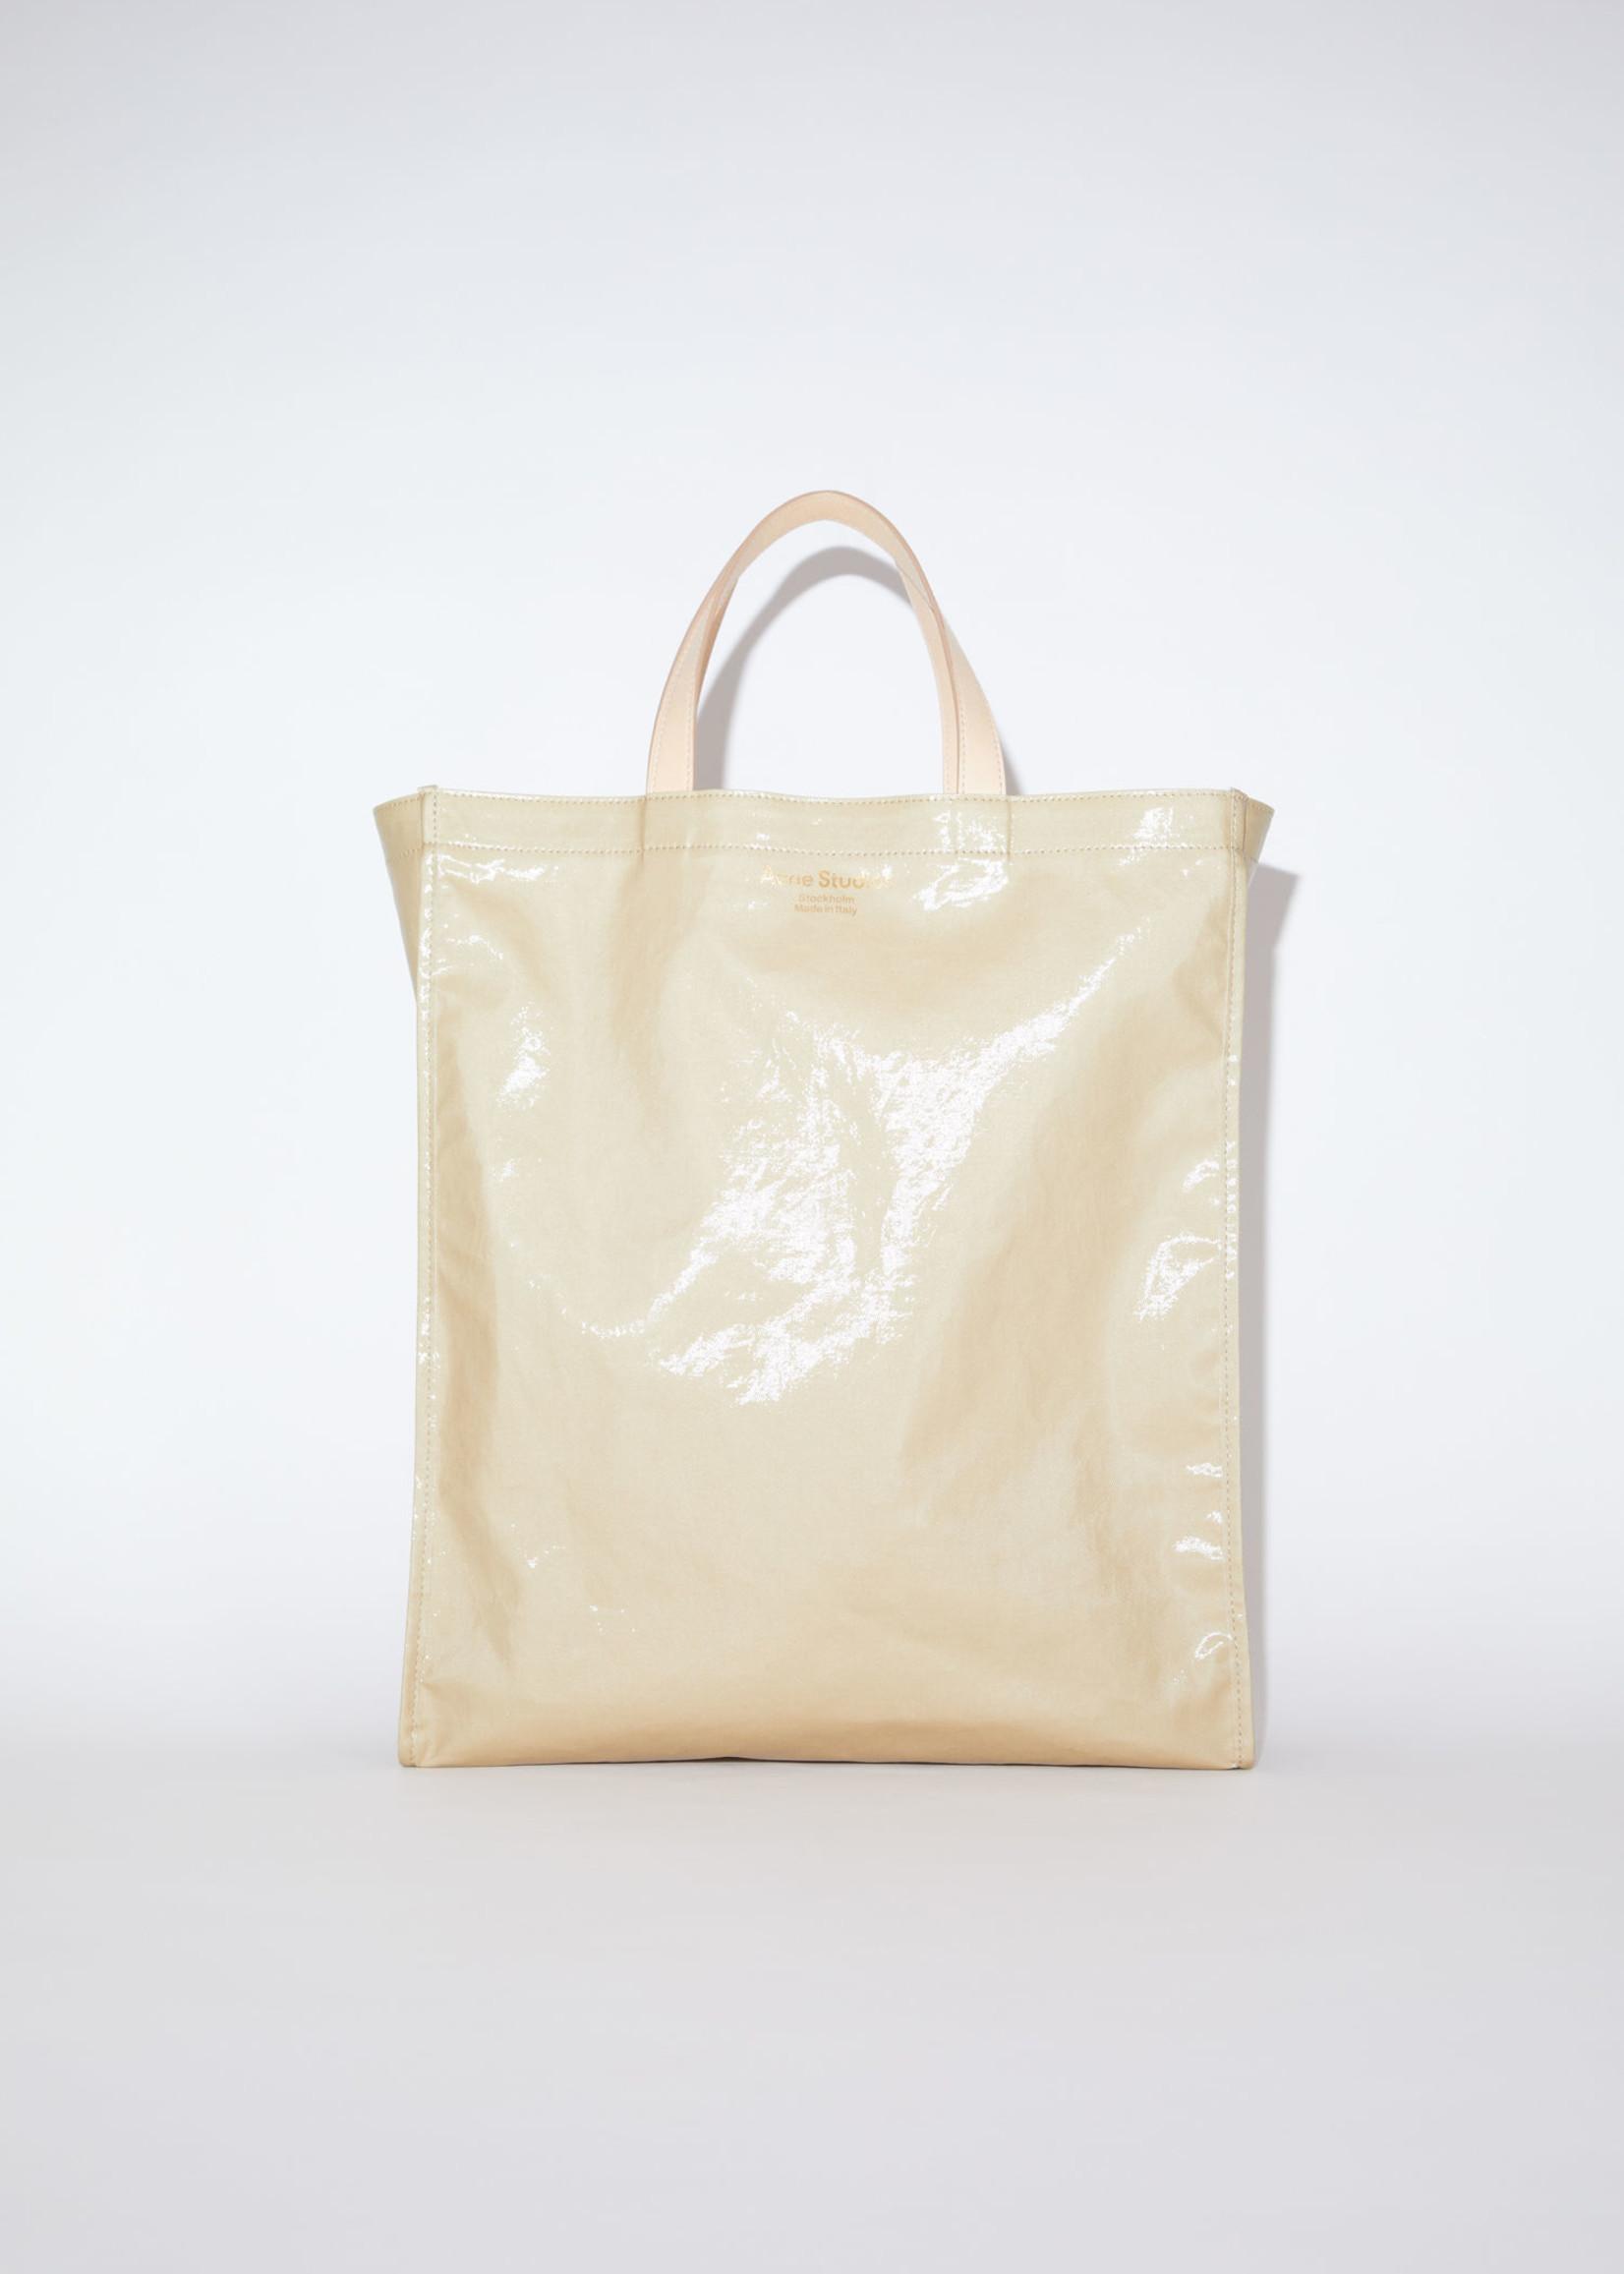 Acne Studios Acnestudios shopper beige